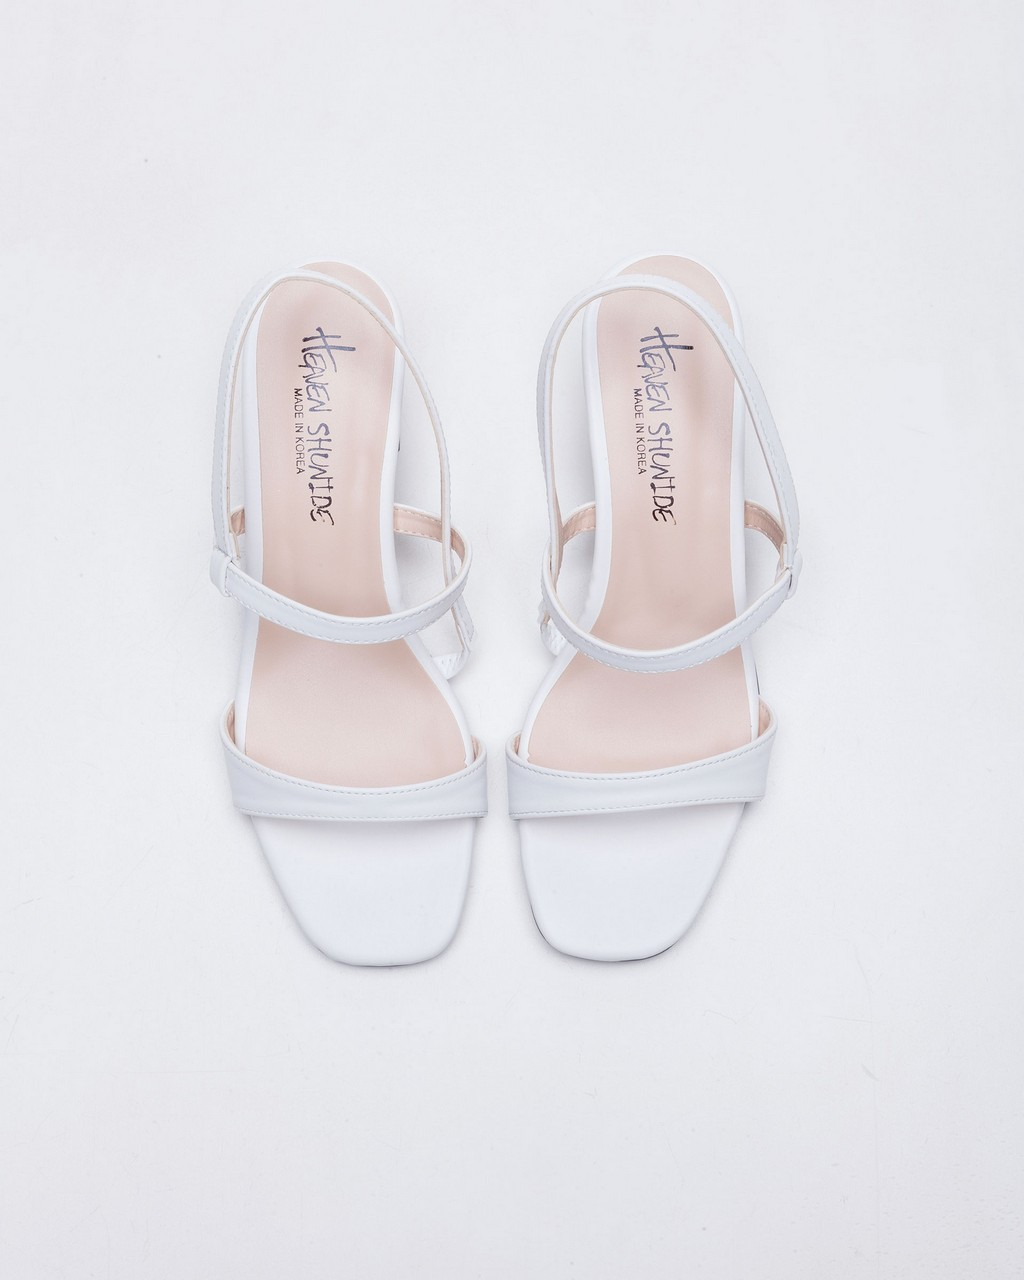 Tagtraume Cushy-03 - White(화이트)